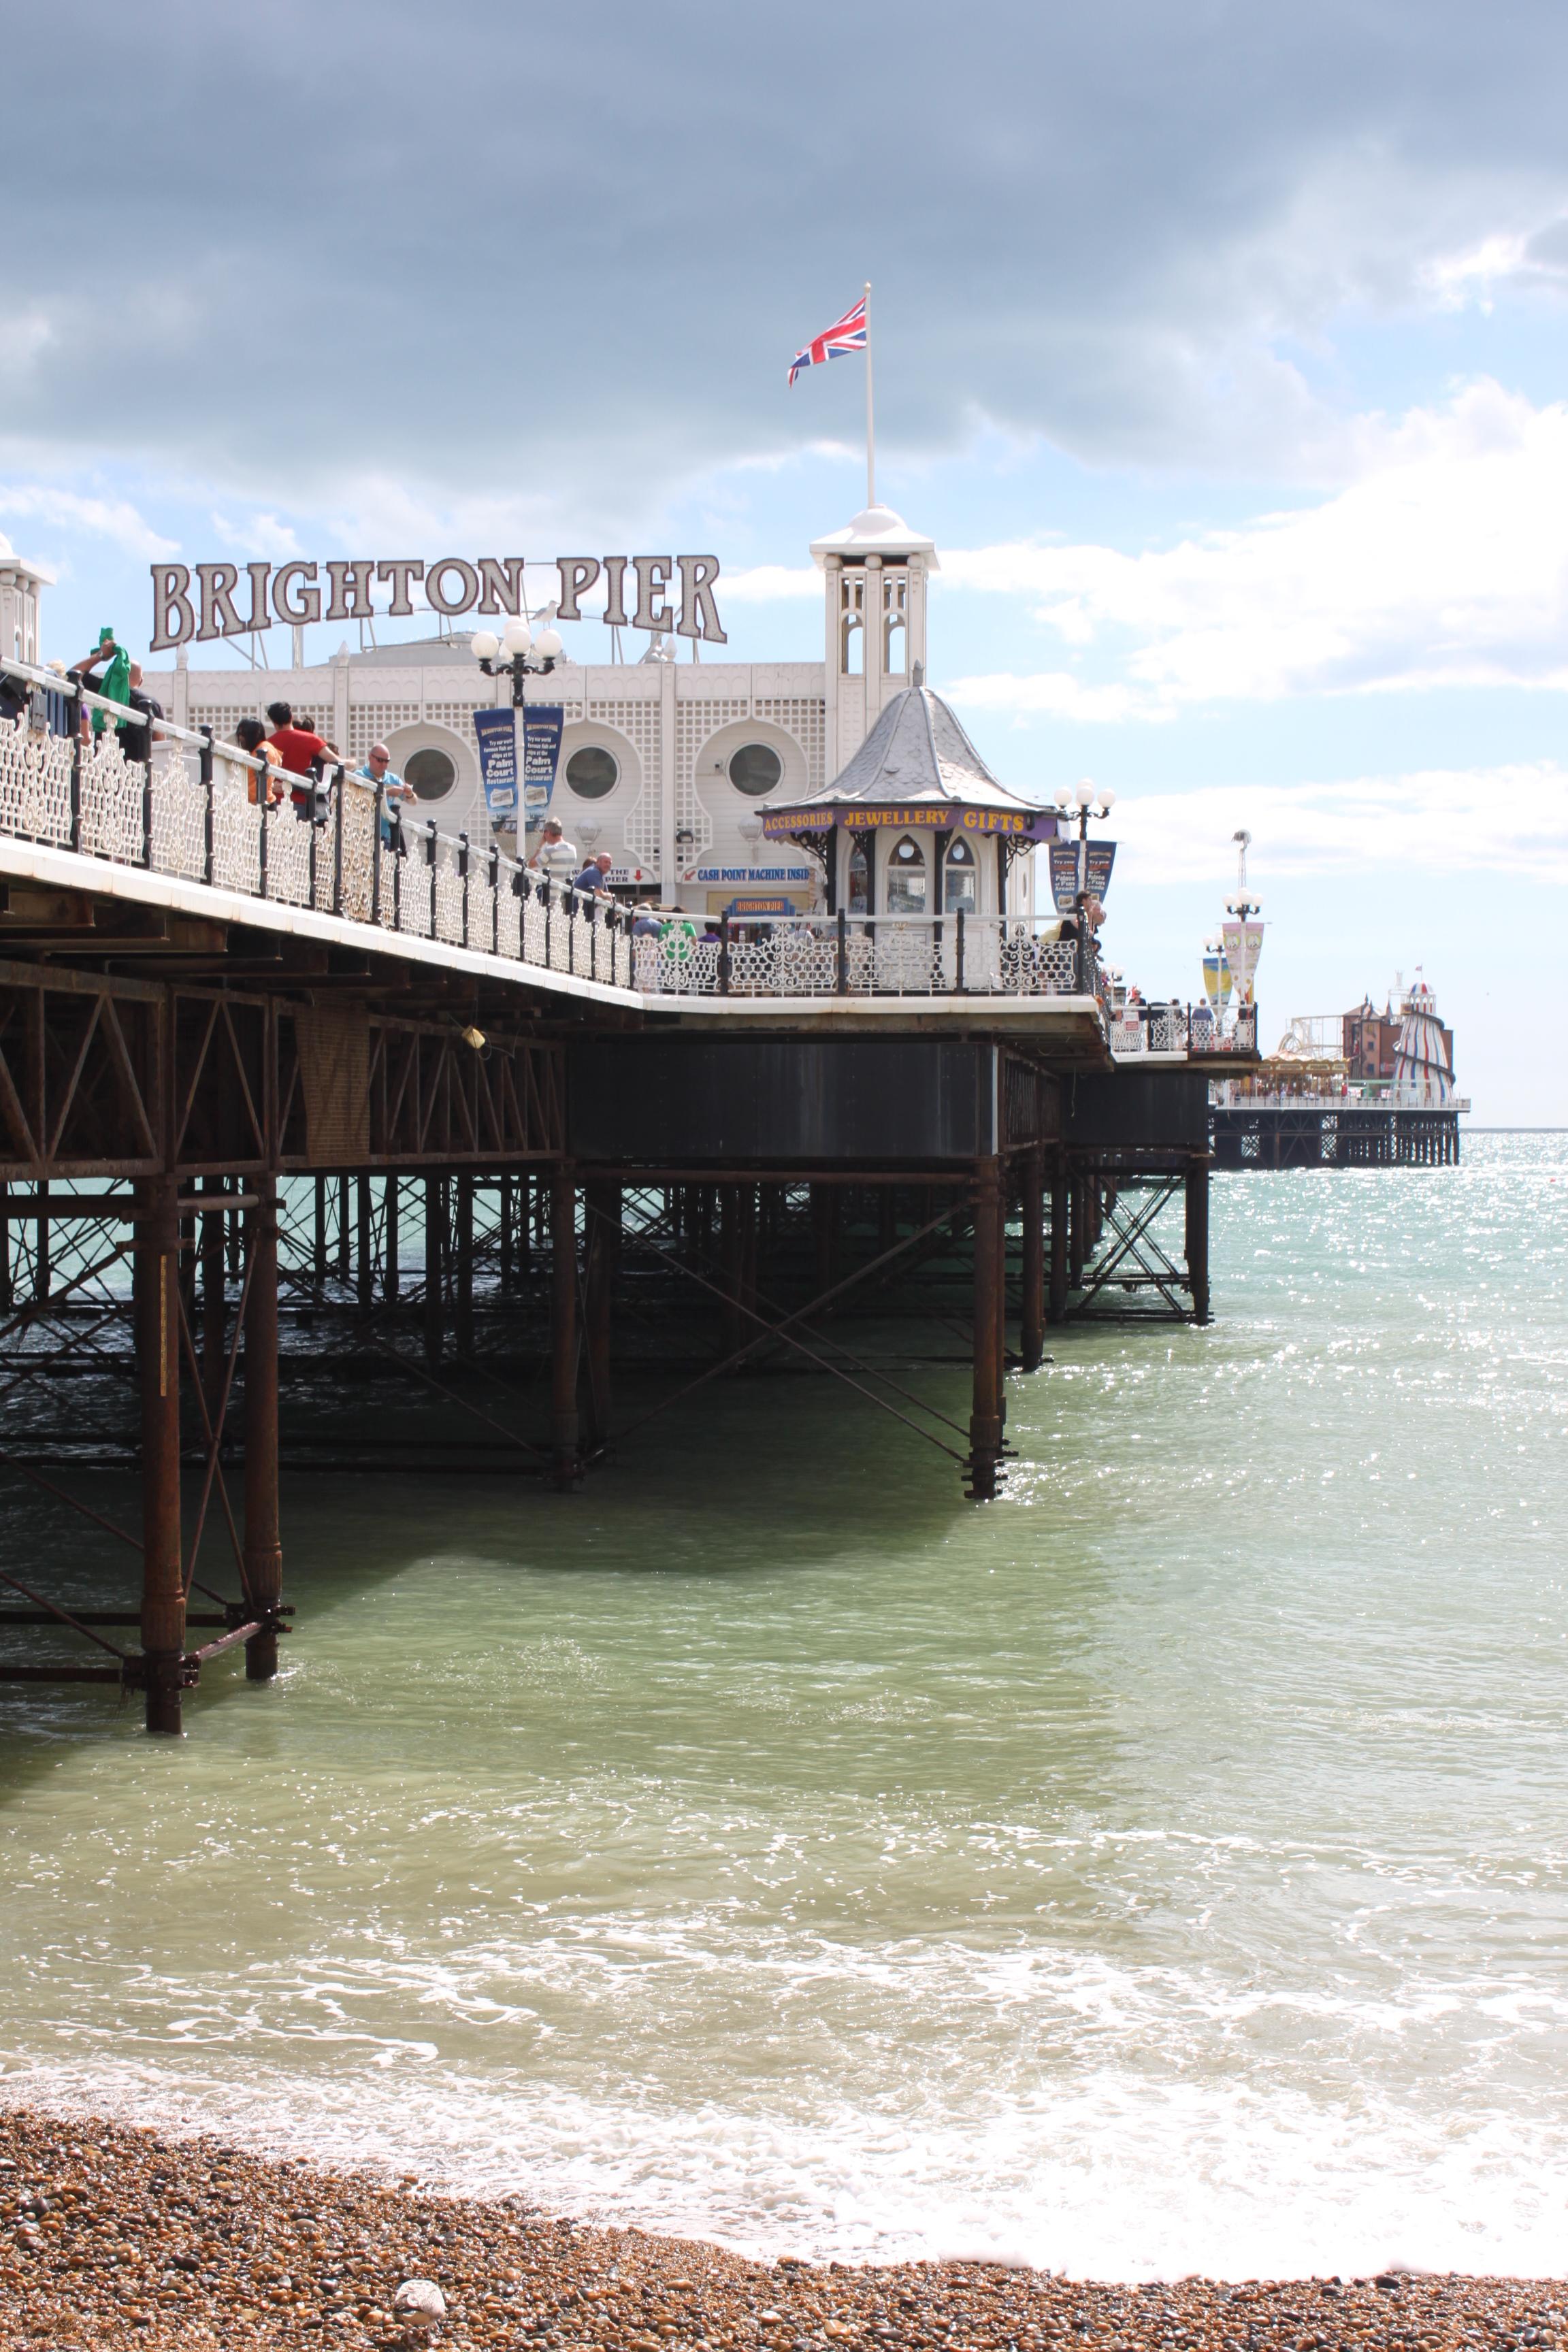 Brighton Pier, a popular destination in the city.